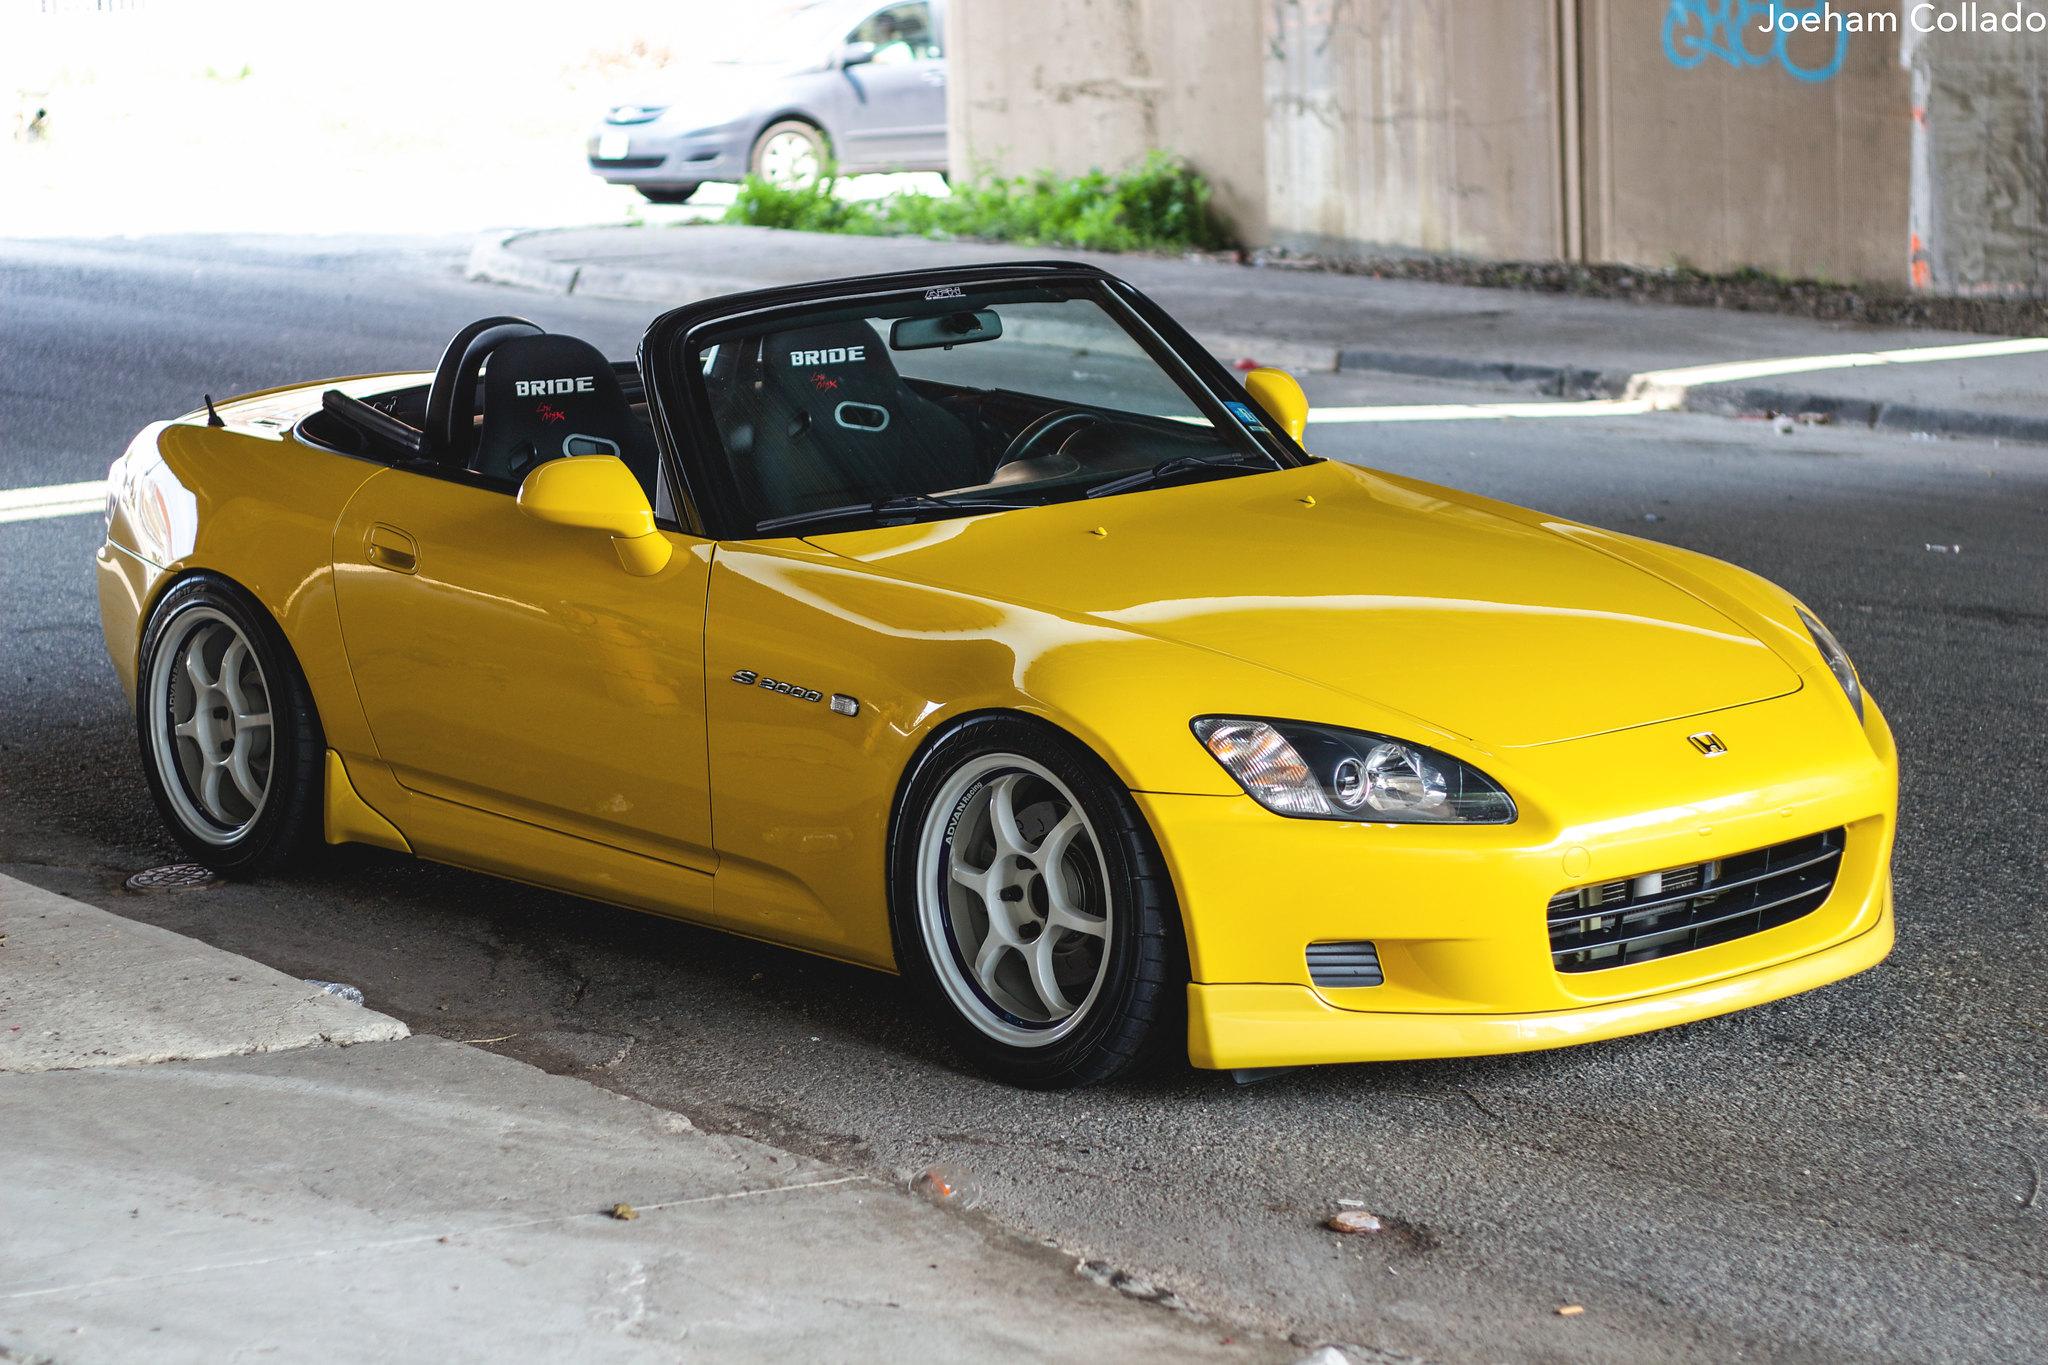 Honda Of Seattle >> My 2001 Spa Yellow S2000 - Honda-Tech - Honda Forum Discussion